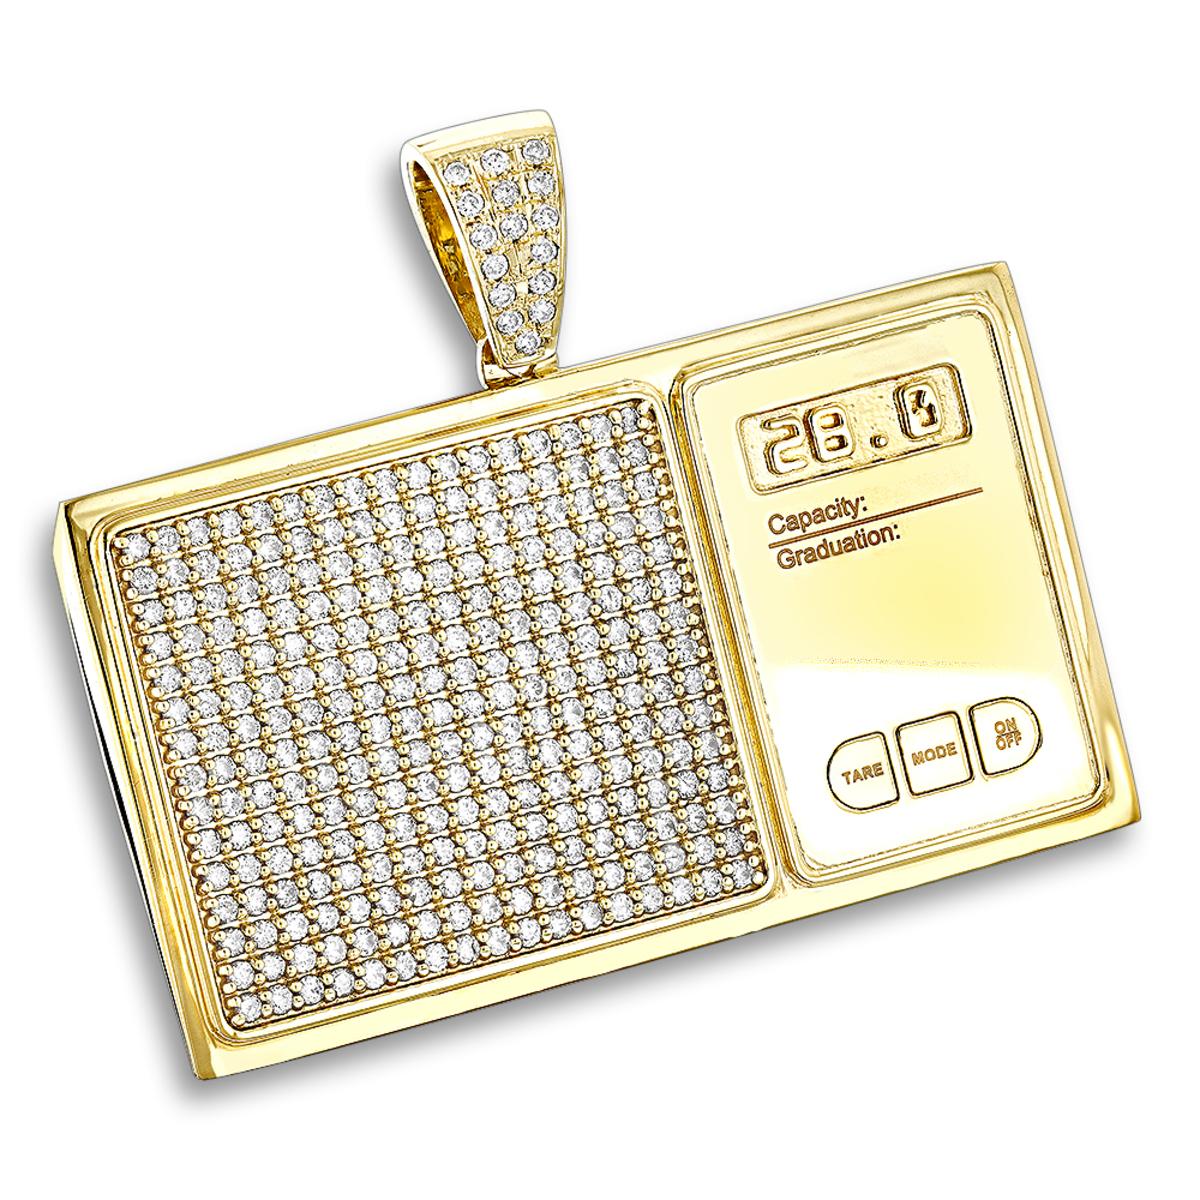 Custom Jewelry: 10K Gold Diamond Digital Scale Mens Pendant 4ct